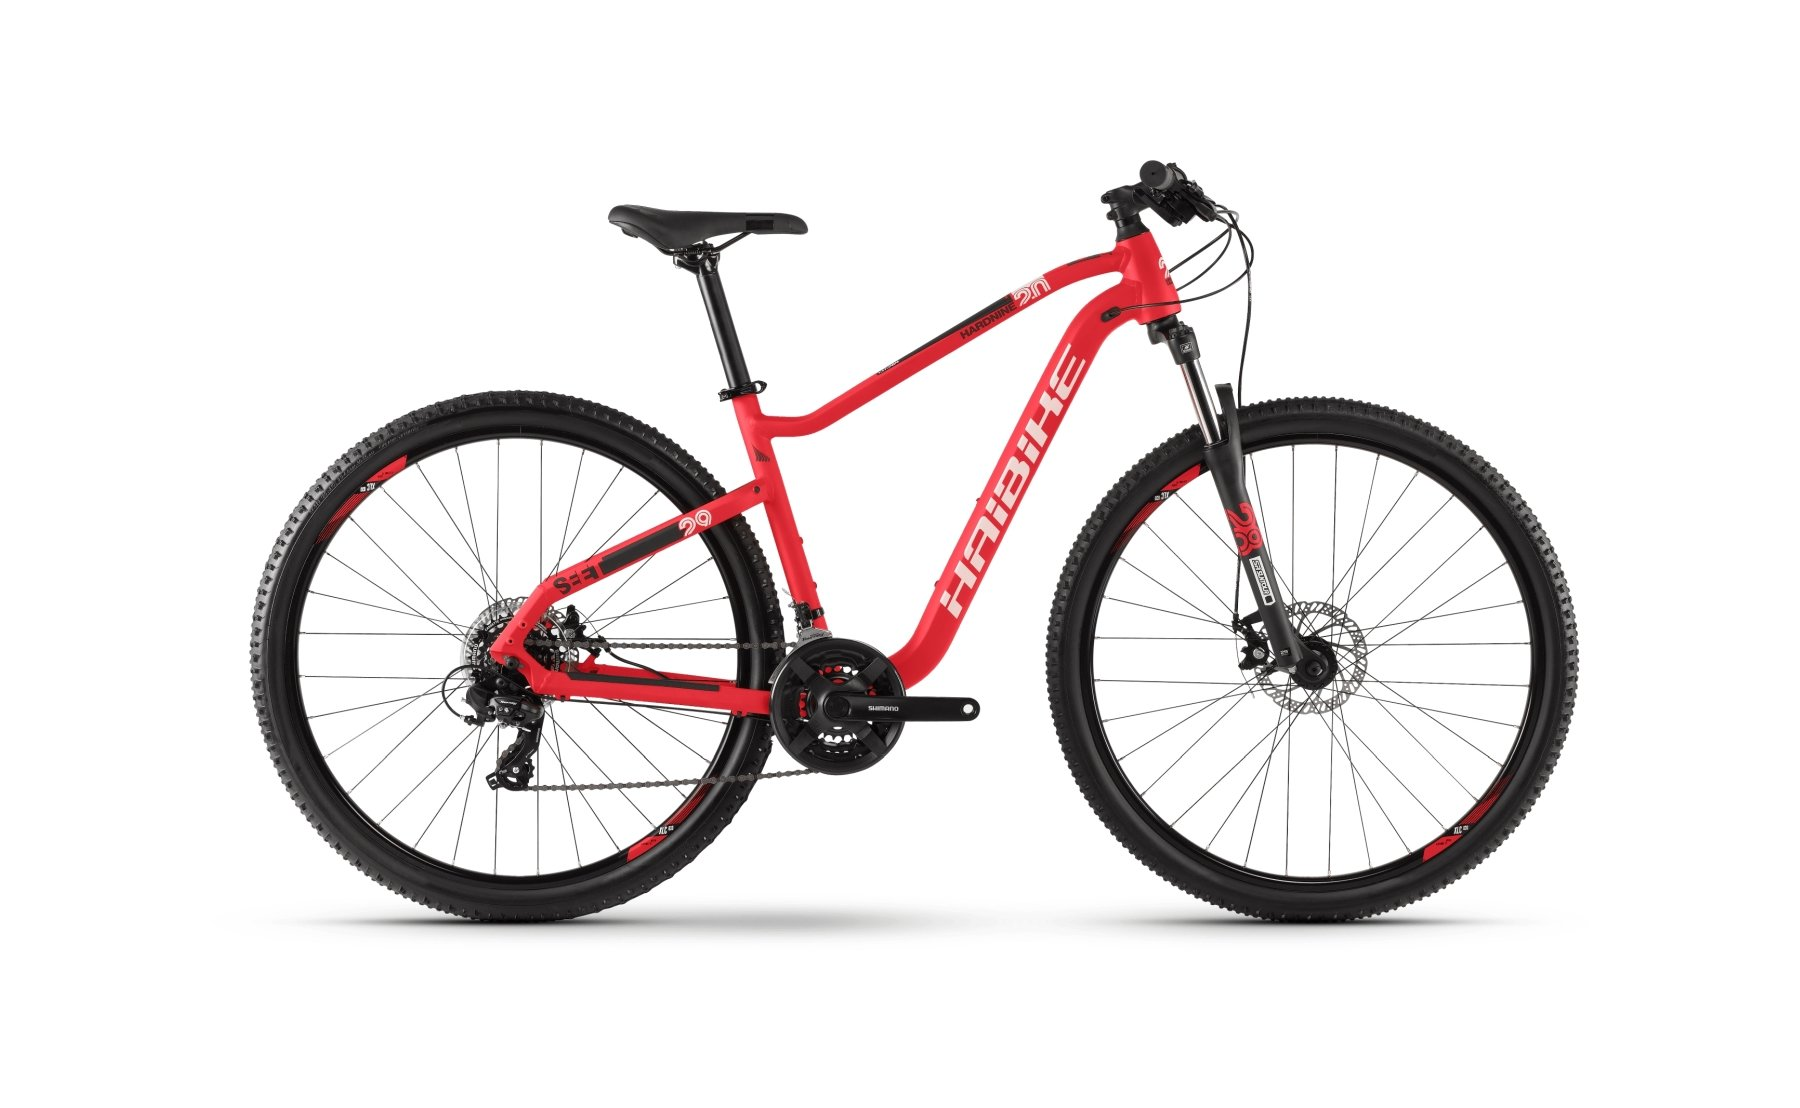 haibike seet hardnine 2 0 2020 29 zoll kaufen fahrrad xxl. Black Bedroom Furniture Sets. Home Design Ideas